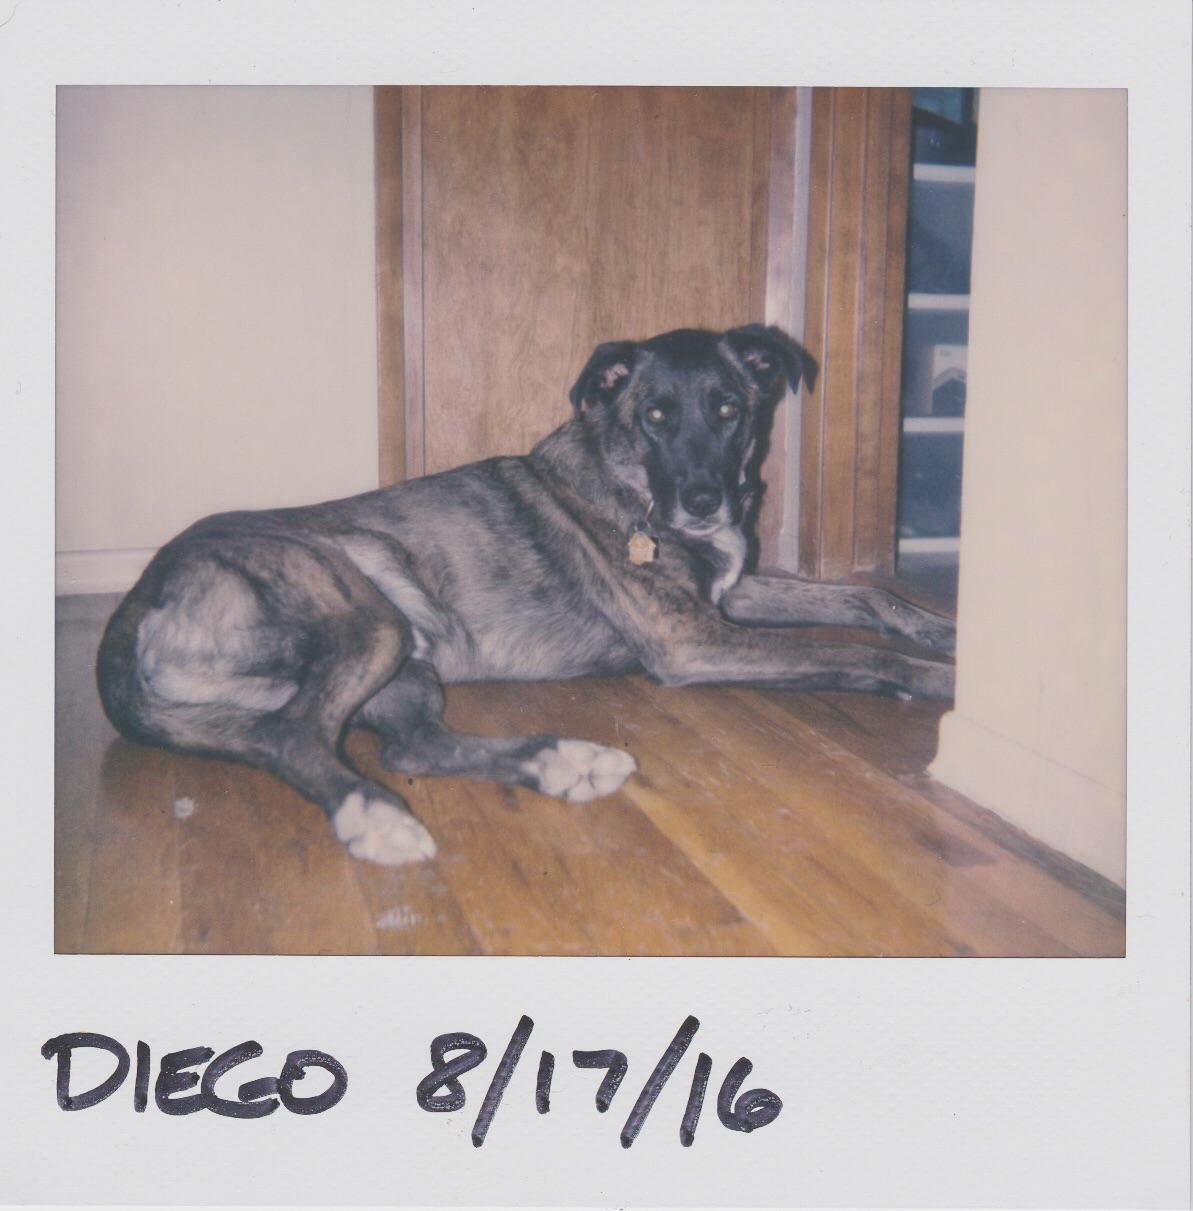 Diego | Polaroid Spectra 2 | Impossible Project Film | Daniel Hedrick